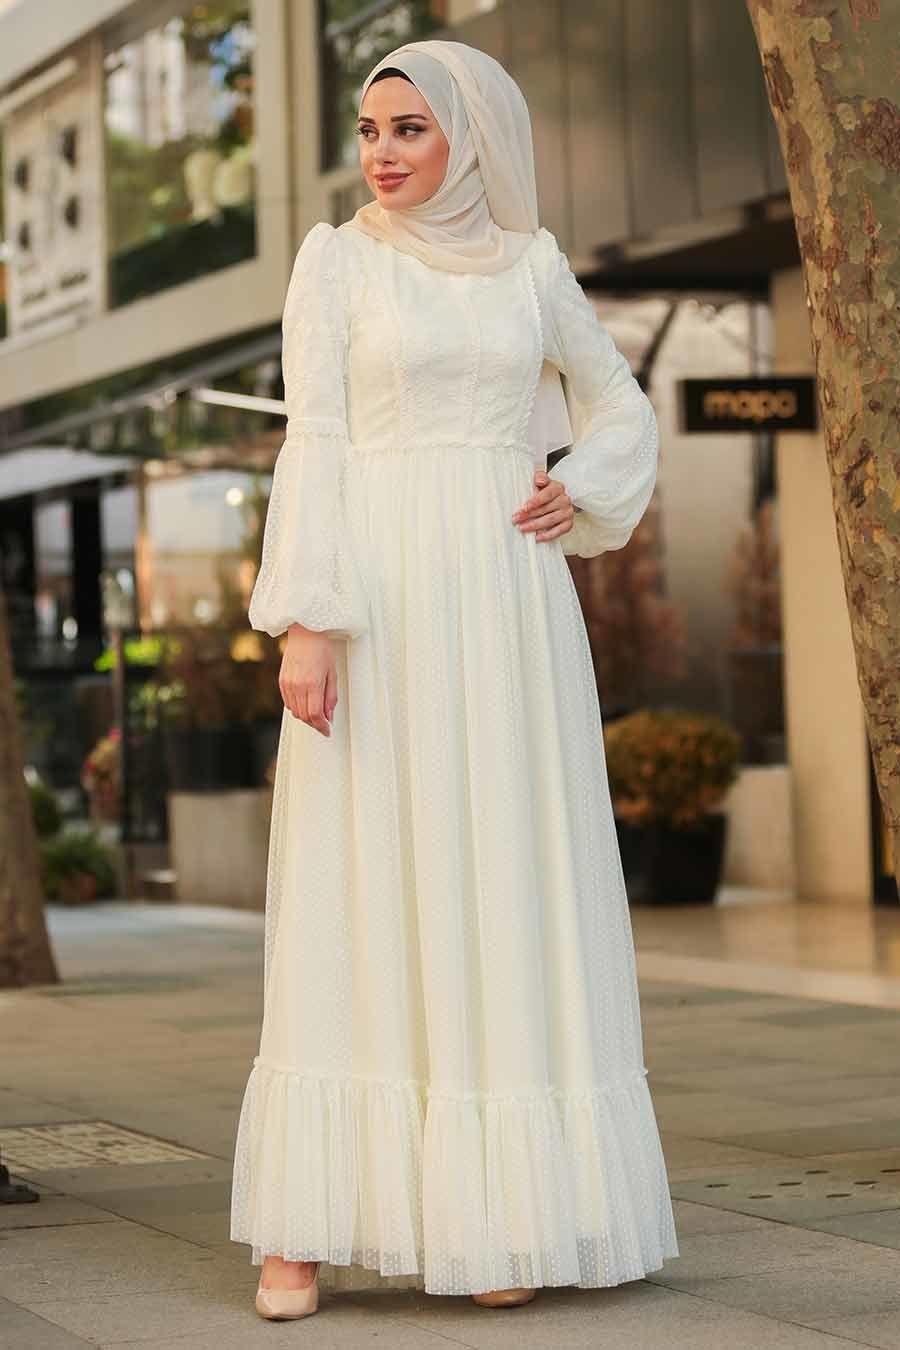 Tesetturlu Abiye Elbise Dantel Islemeli Ekru Tesettur Abiye Elbise 3890e Model Pakaian Hijab Pakaian Wanita Model Pakaian Muslim